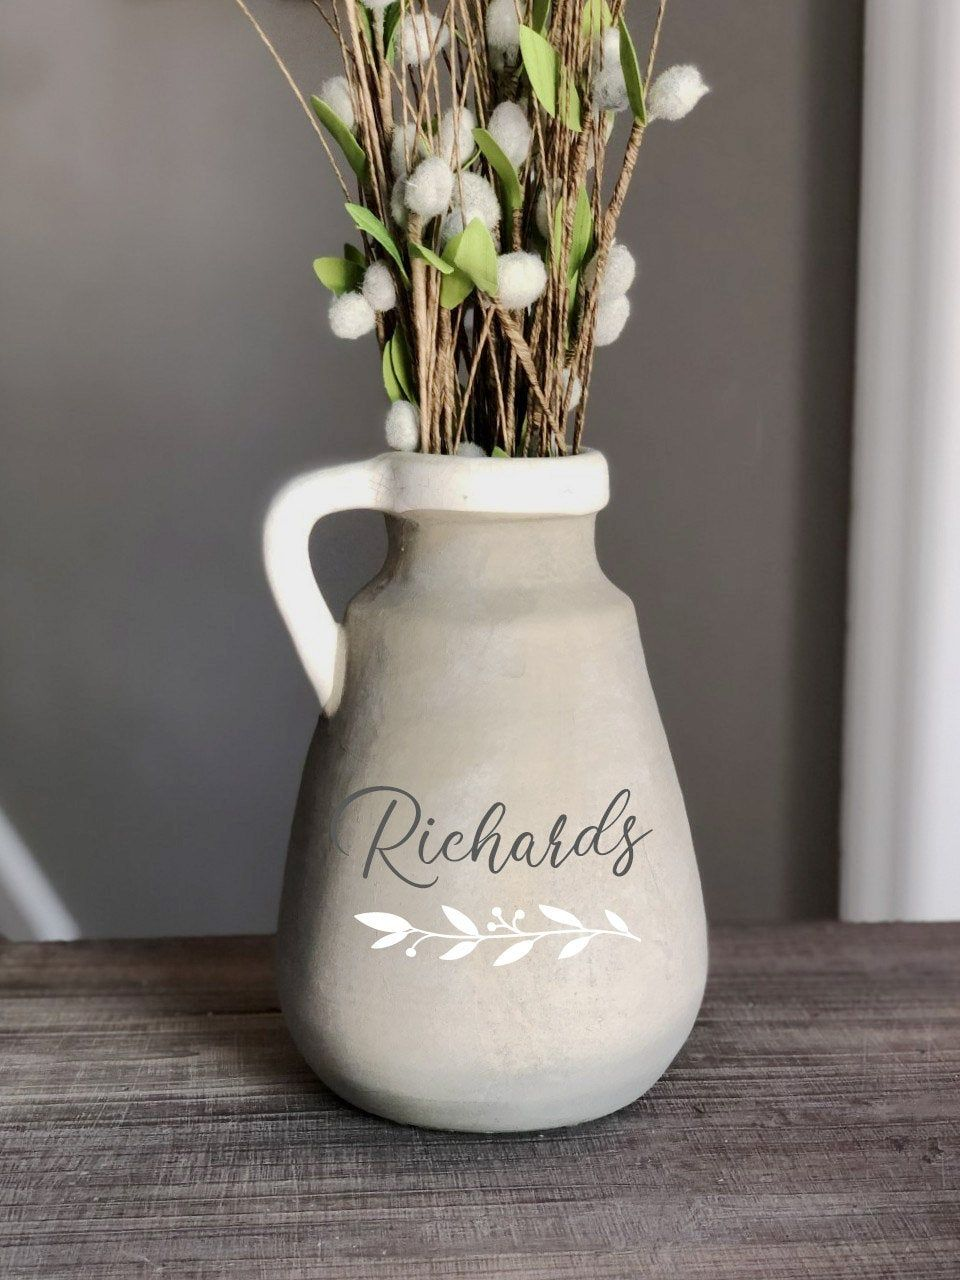 Custom Natural Ceramic Milk Jug Vase Wedding Gift Rustic Etsy In 2020 Natural Ceramic Milk Jug Vase Rustic Wedding Gifts